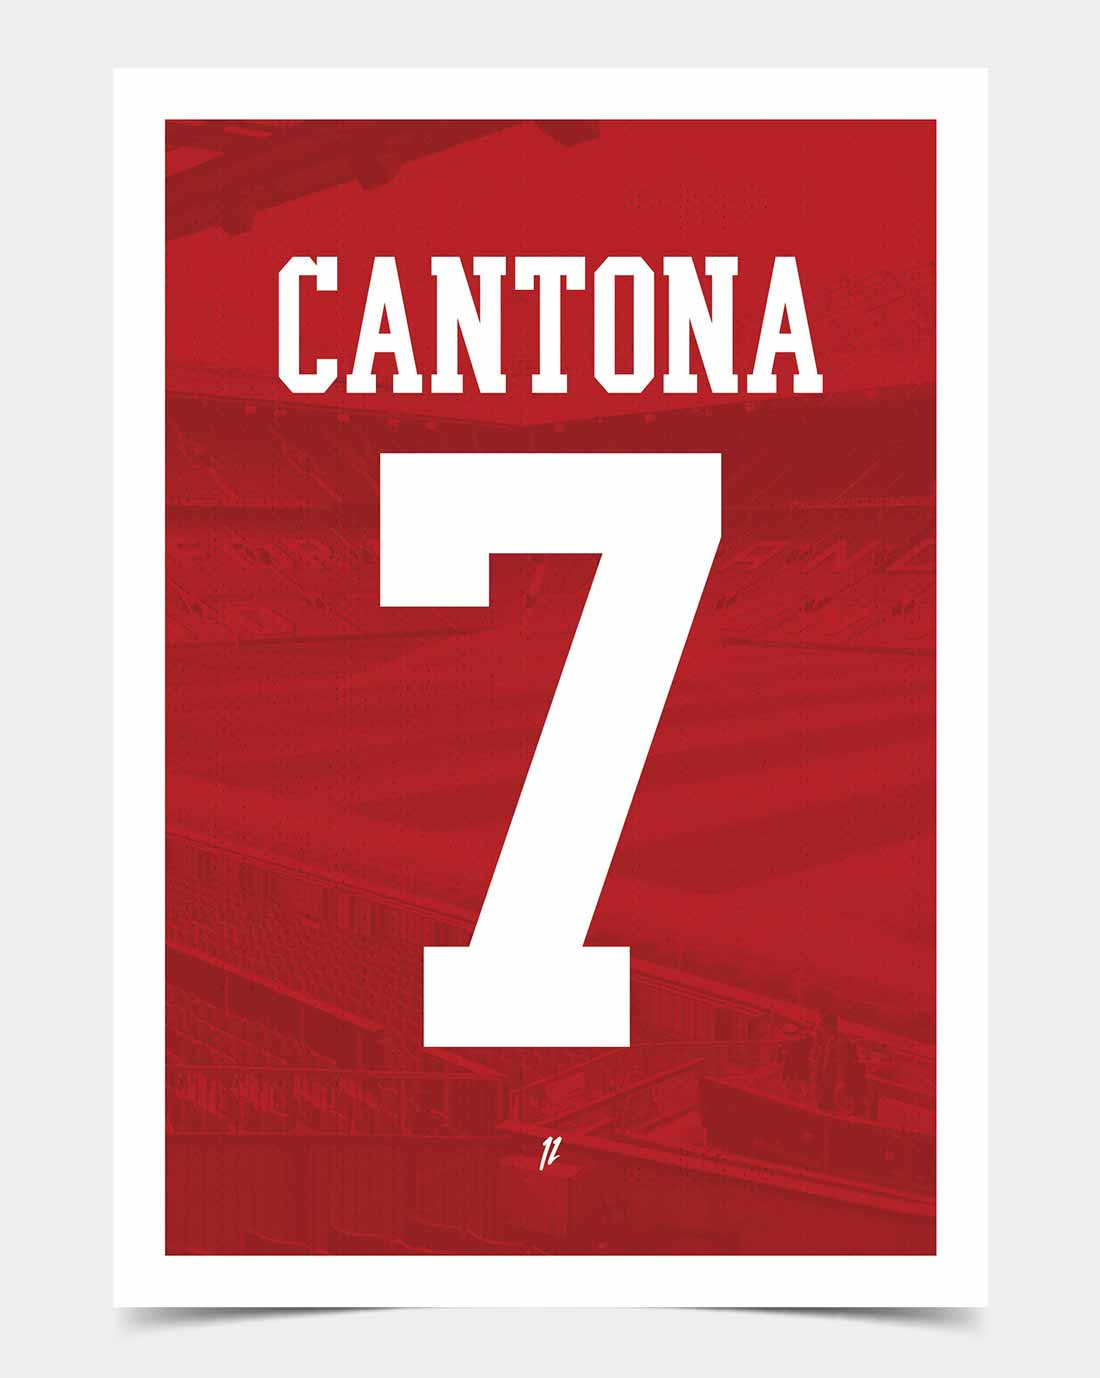 Image of Cantona '92